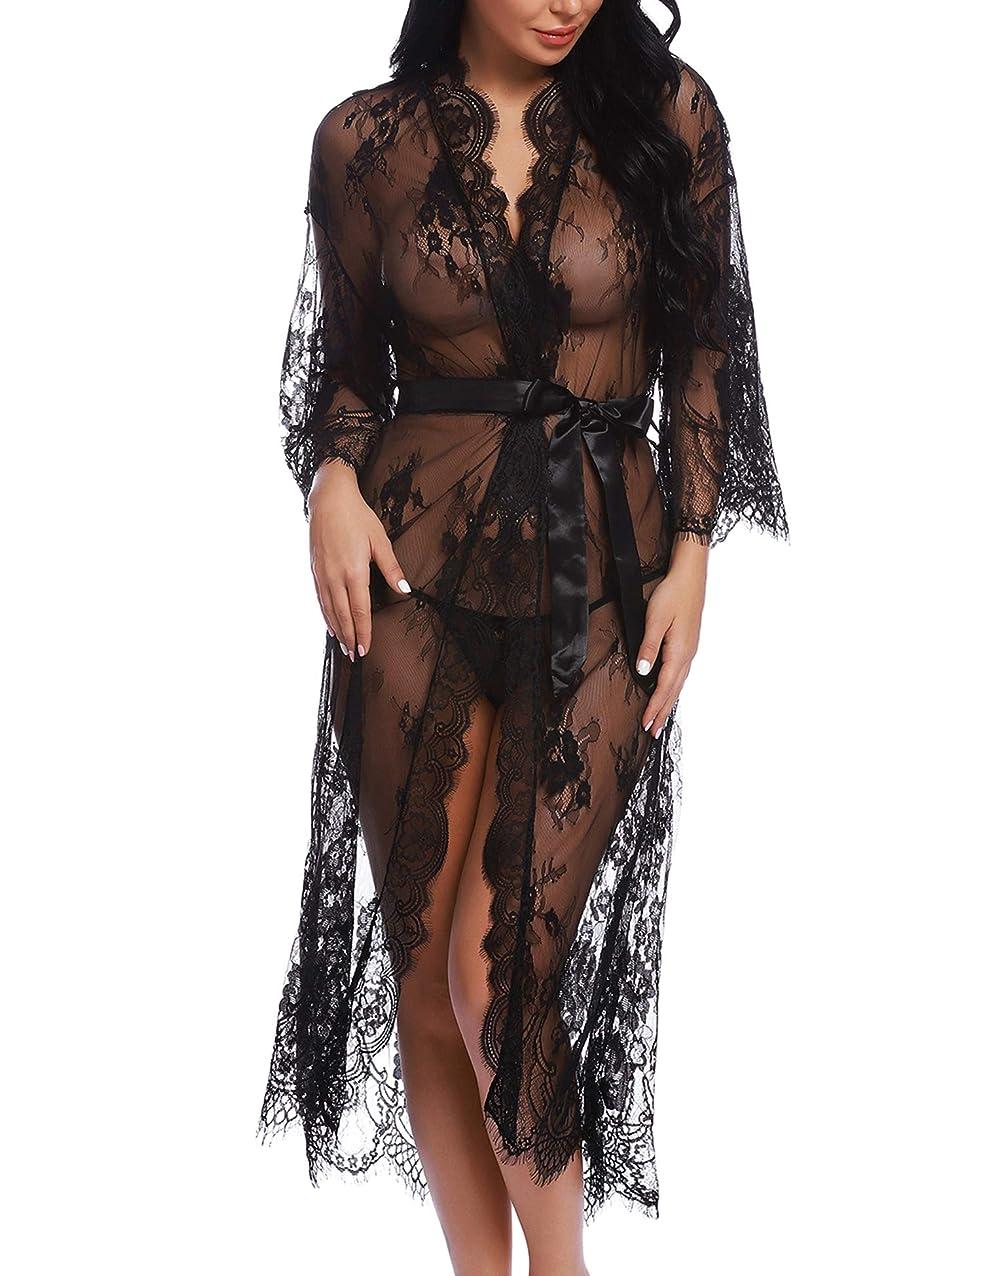 RSLOVE Lingerie for Women Sexy Long Lace Kimono Robe Eyelash Babydoll Sheer Cover Up Dress with Satin Belt quqkvqvcnwqhz757